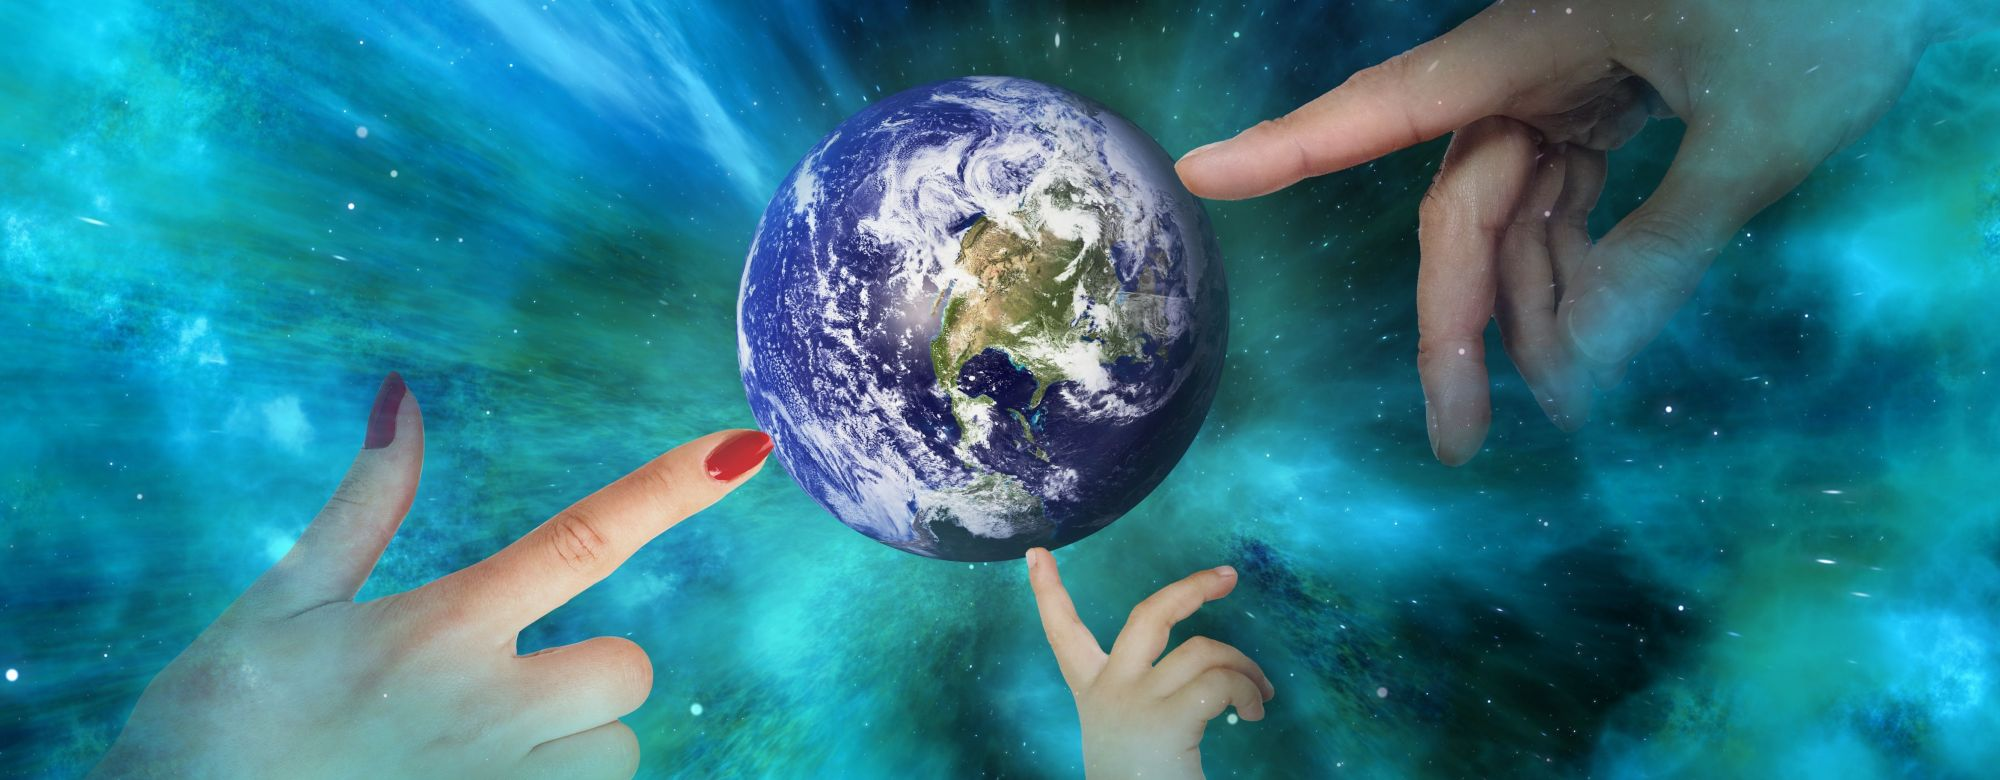 planata ziemia ekologia